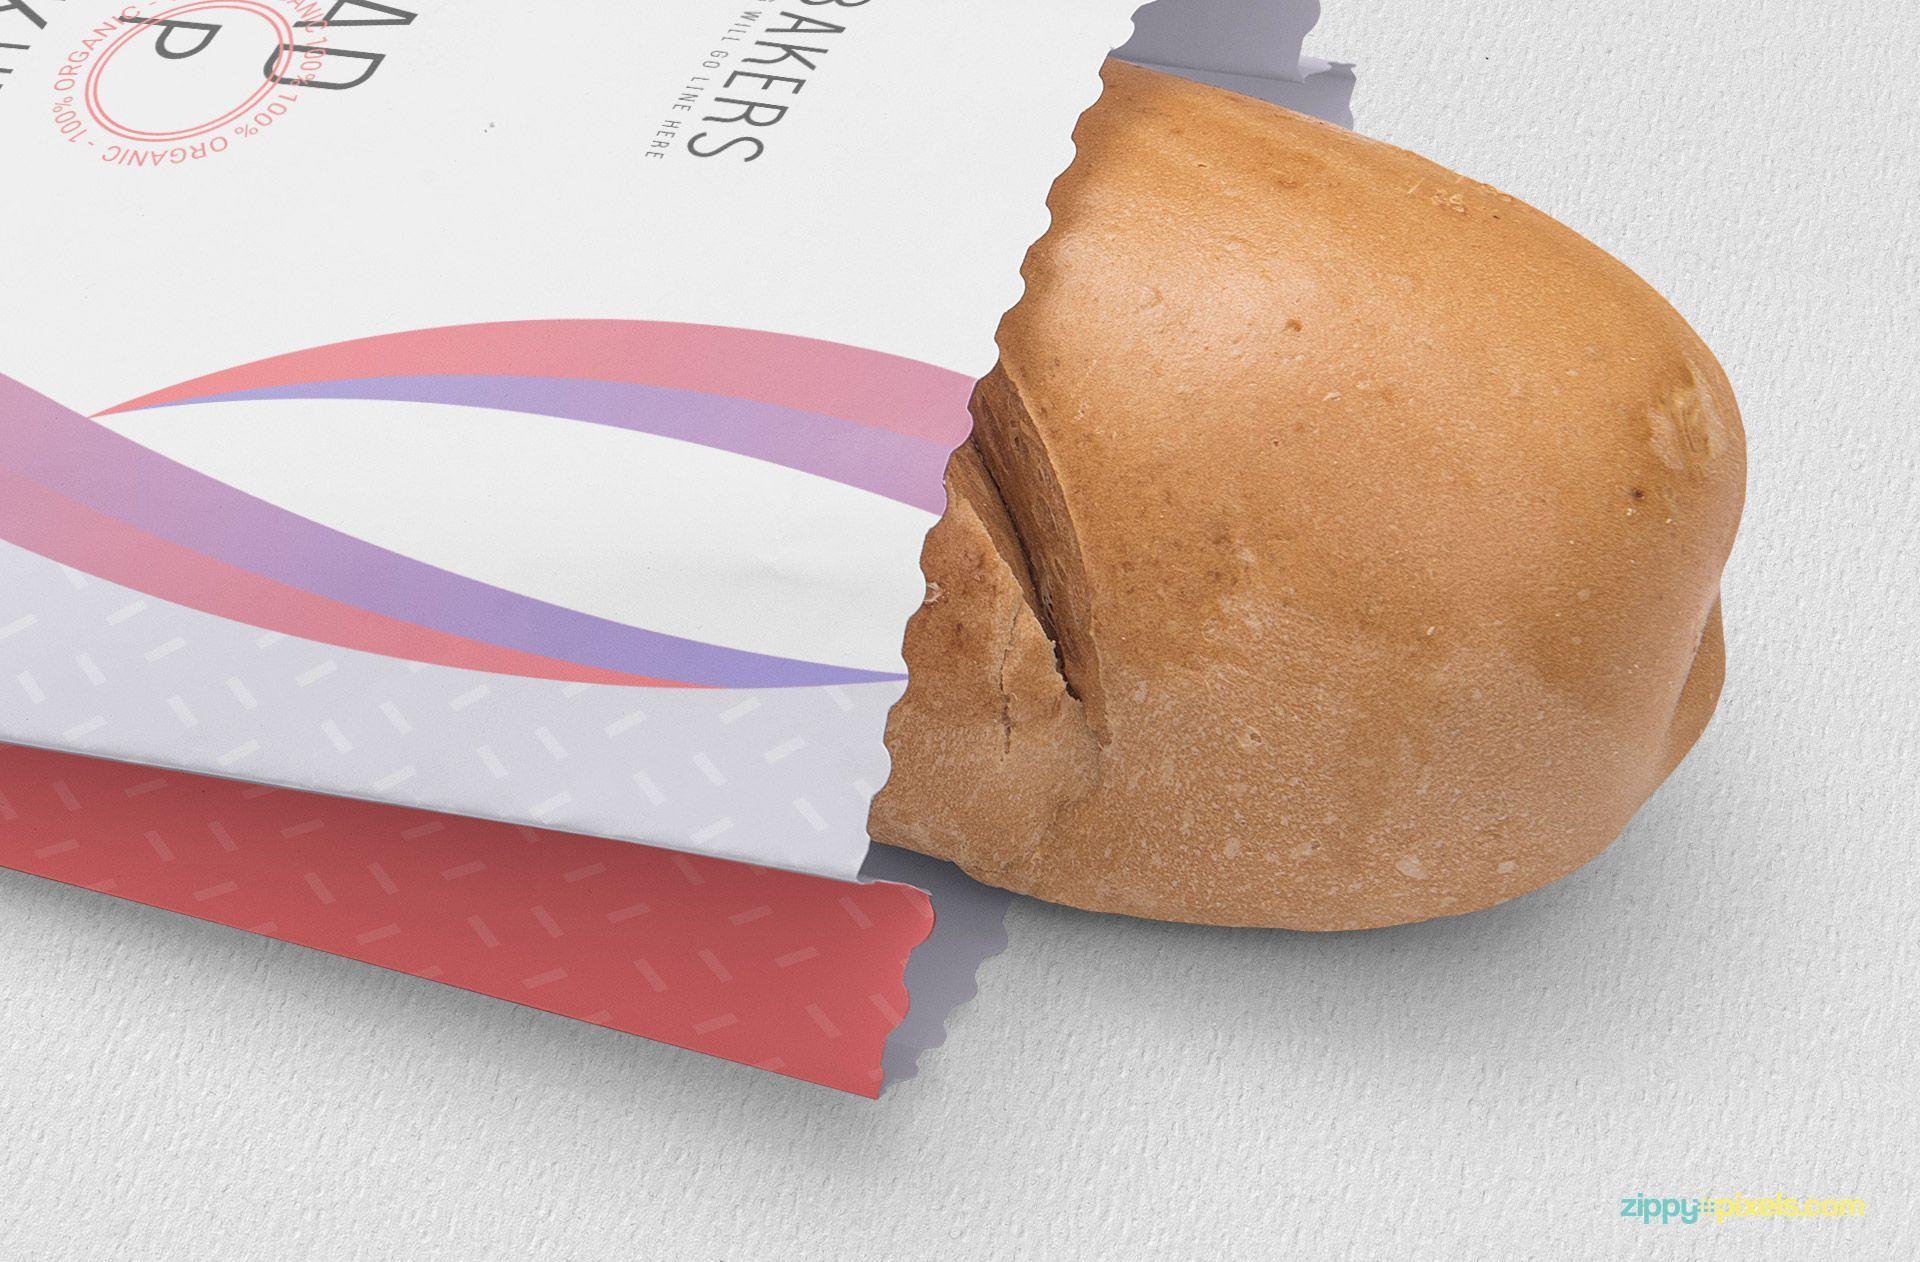 Download Free Bread Packaging Mockup Zippypixels Bread Packaging Packaging Mockup Mockup Psd